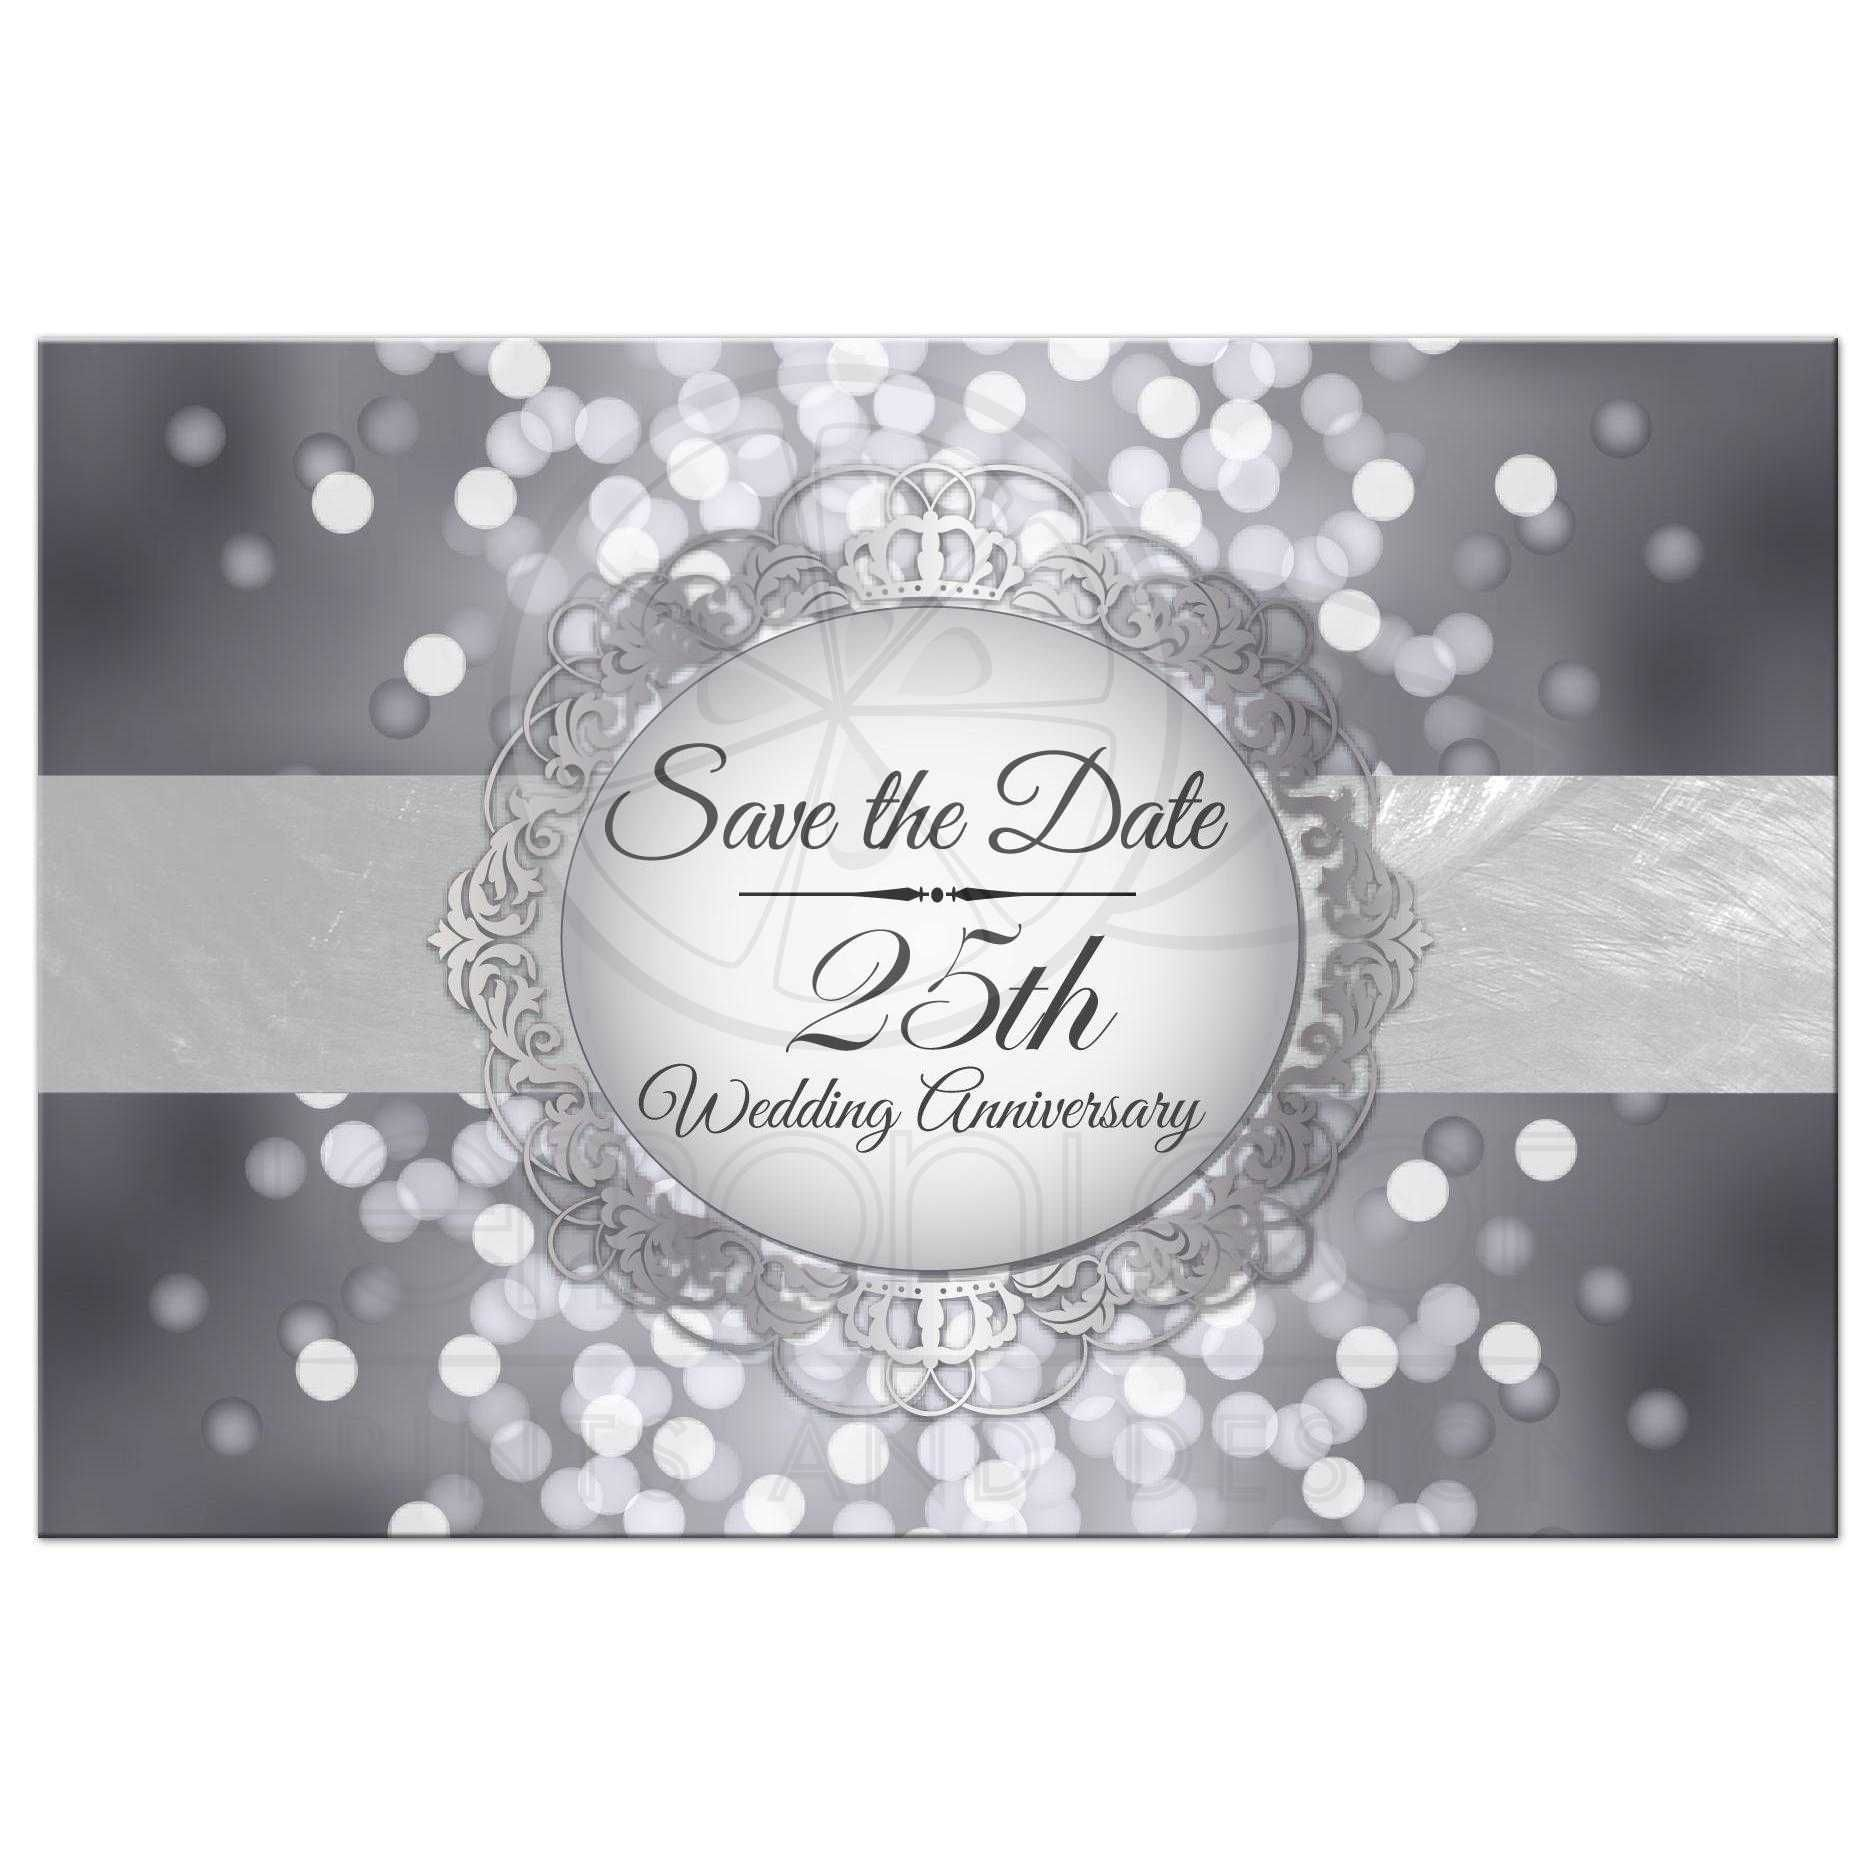 Save The Date Postcard Silver 25th Anniversary Bokeh Medallion 25th Wedding Anniversary Invitations 25th Wedding Anniversary Party Silver Save The Dates